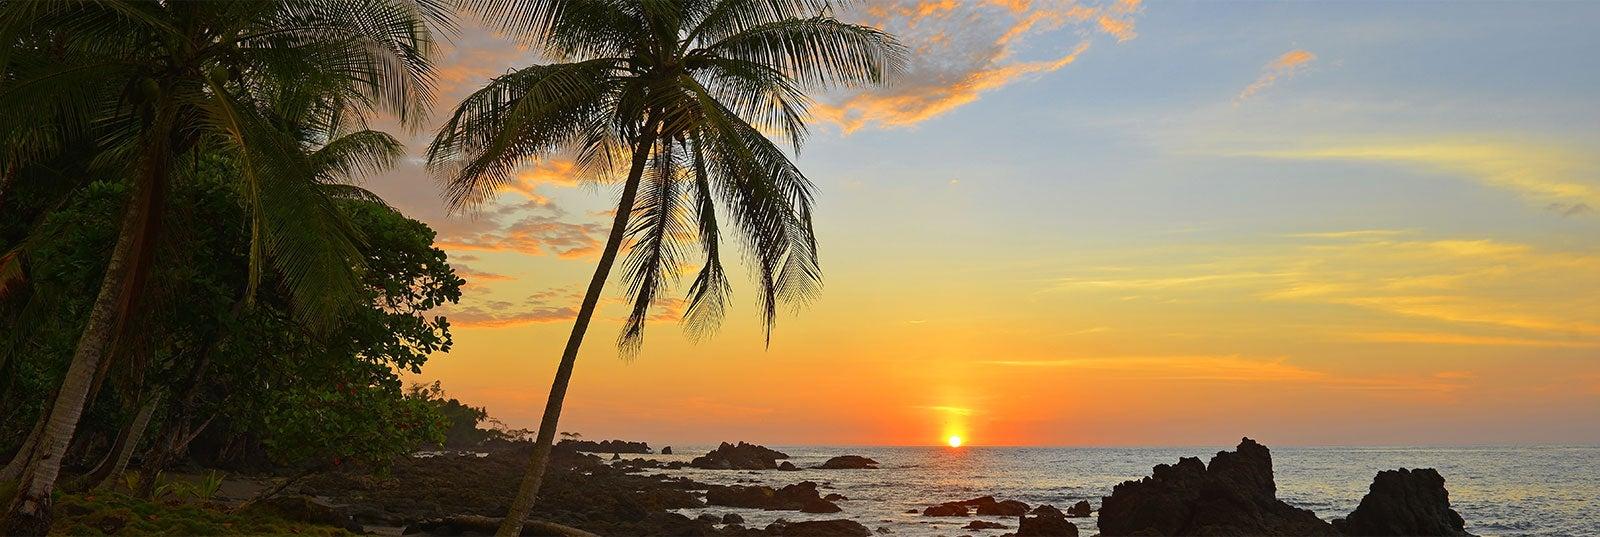 Guía turística de Ilhas Maurício